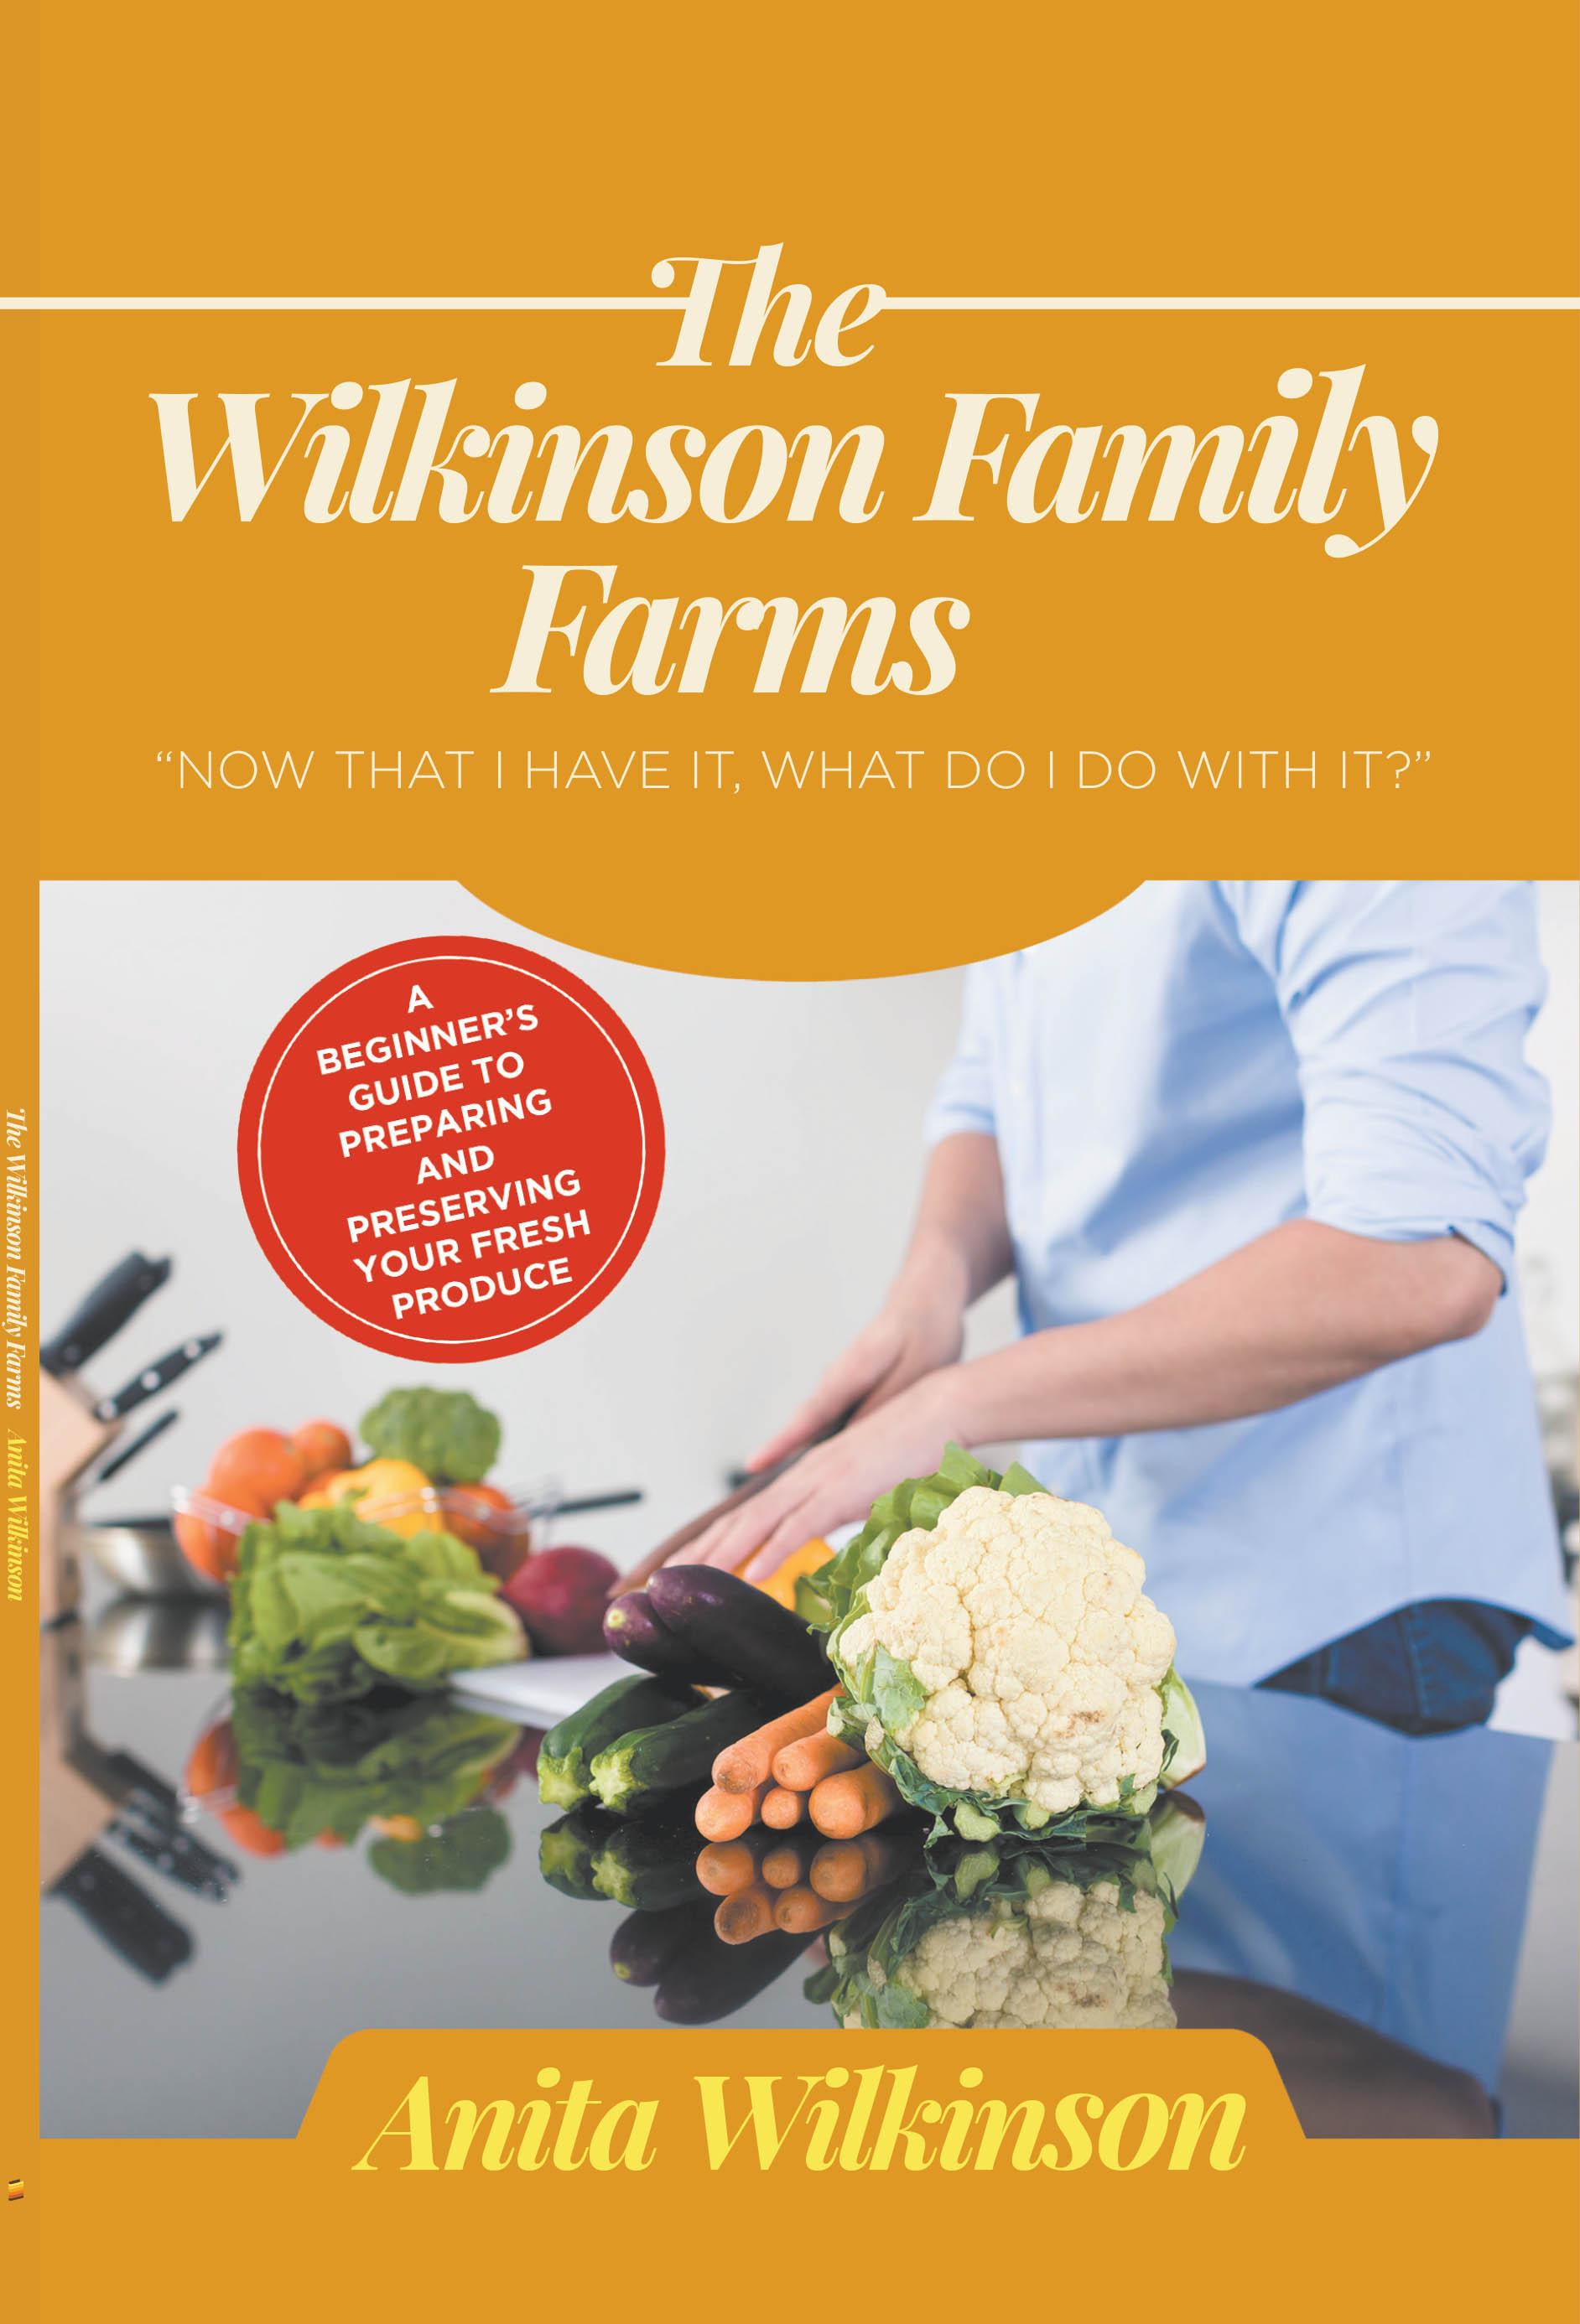 THE WILKINSON FAMILY FARMS